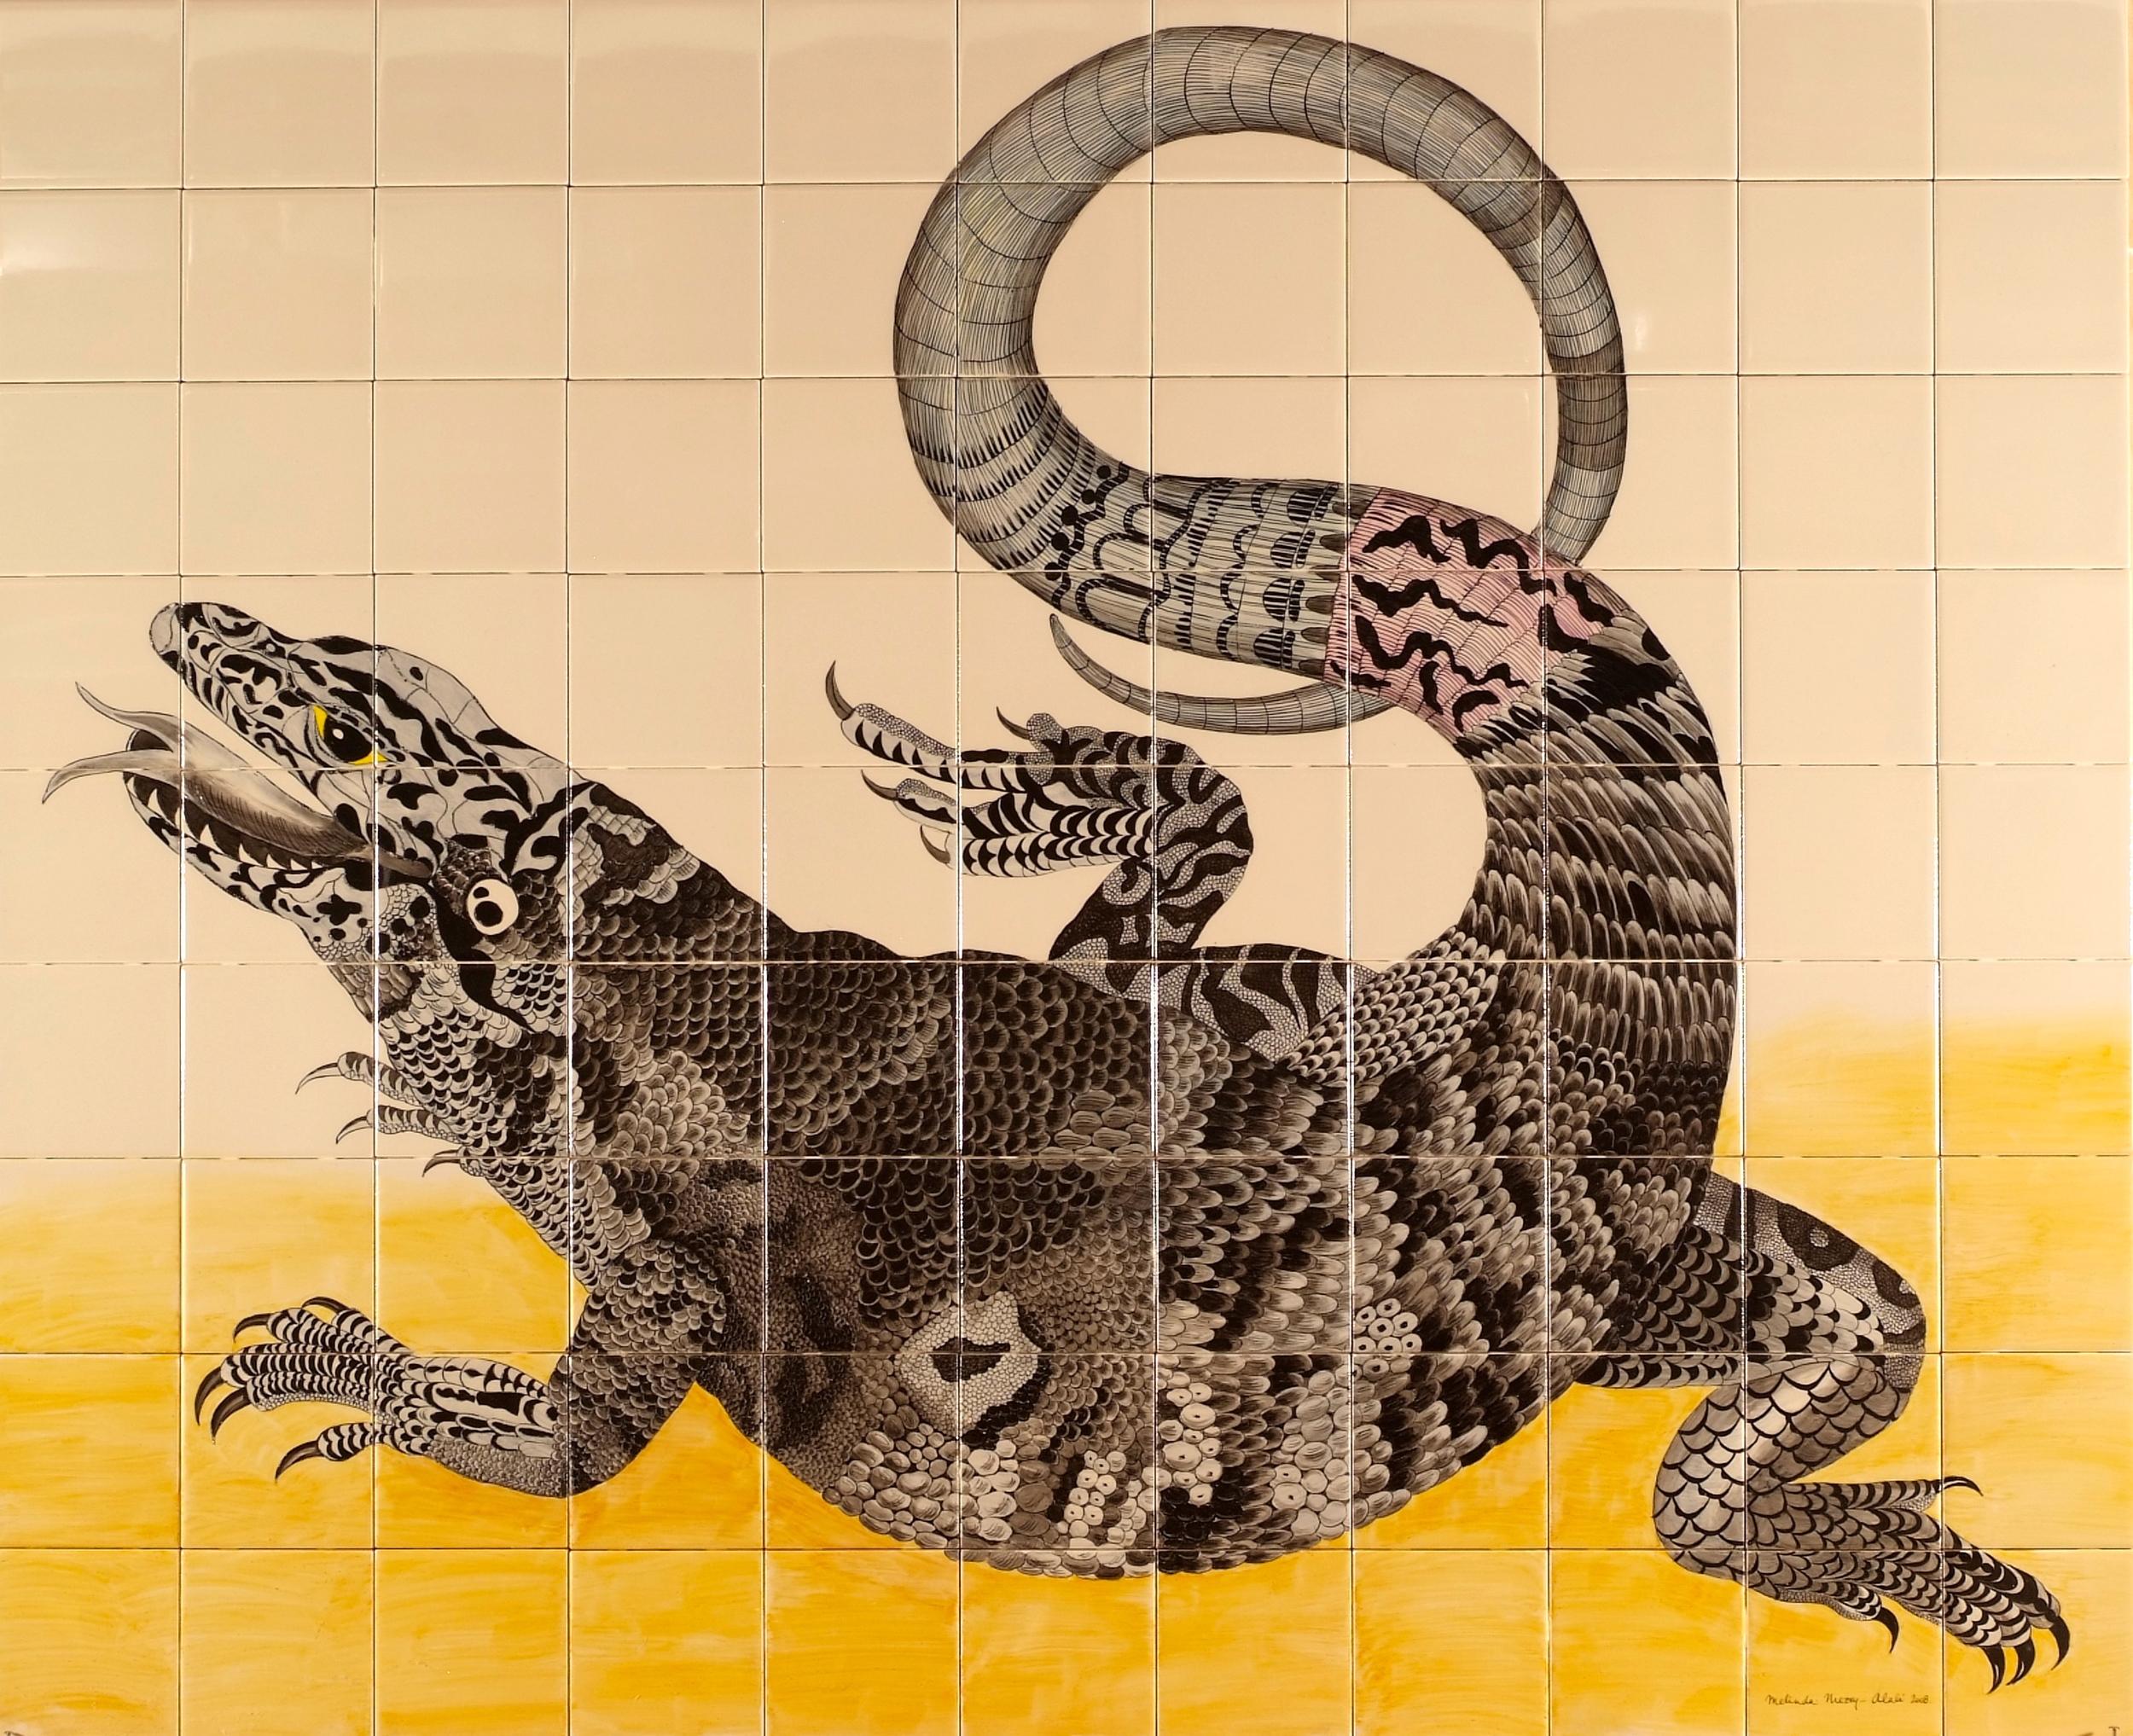 Lizard  - 39 x 47 in, 99 x 120 cm